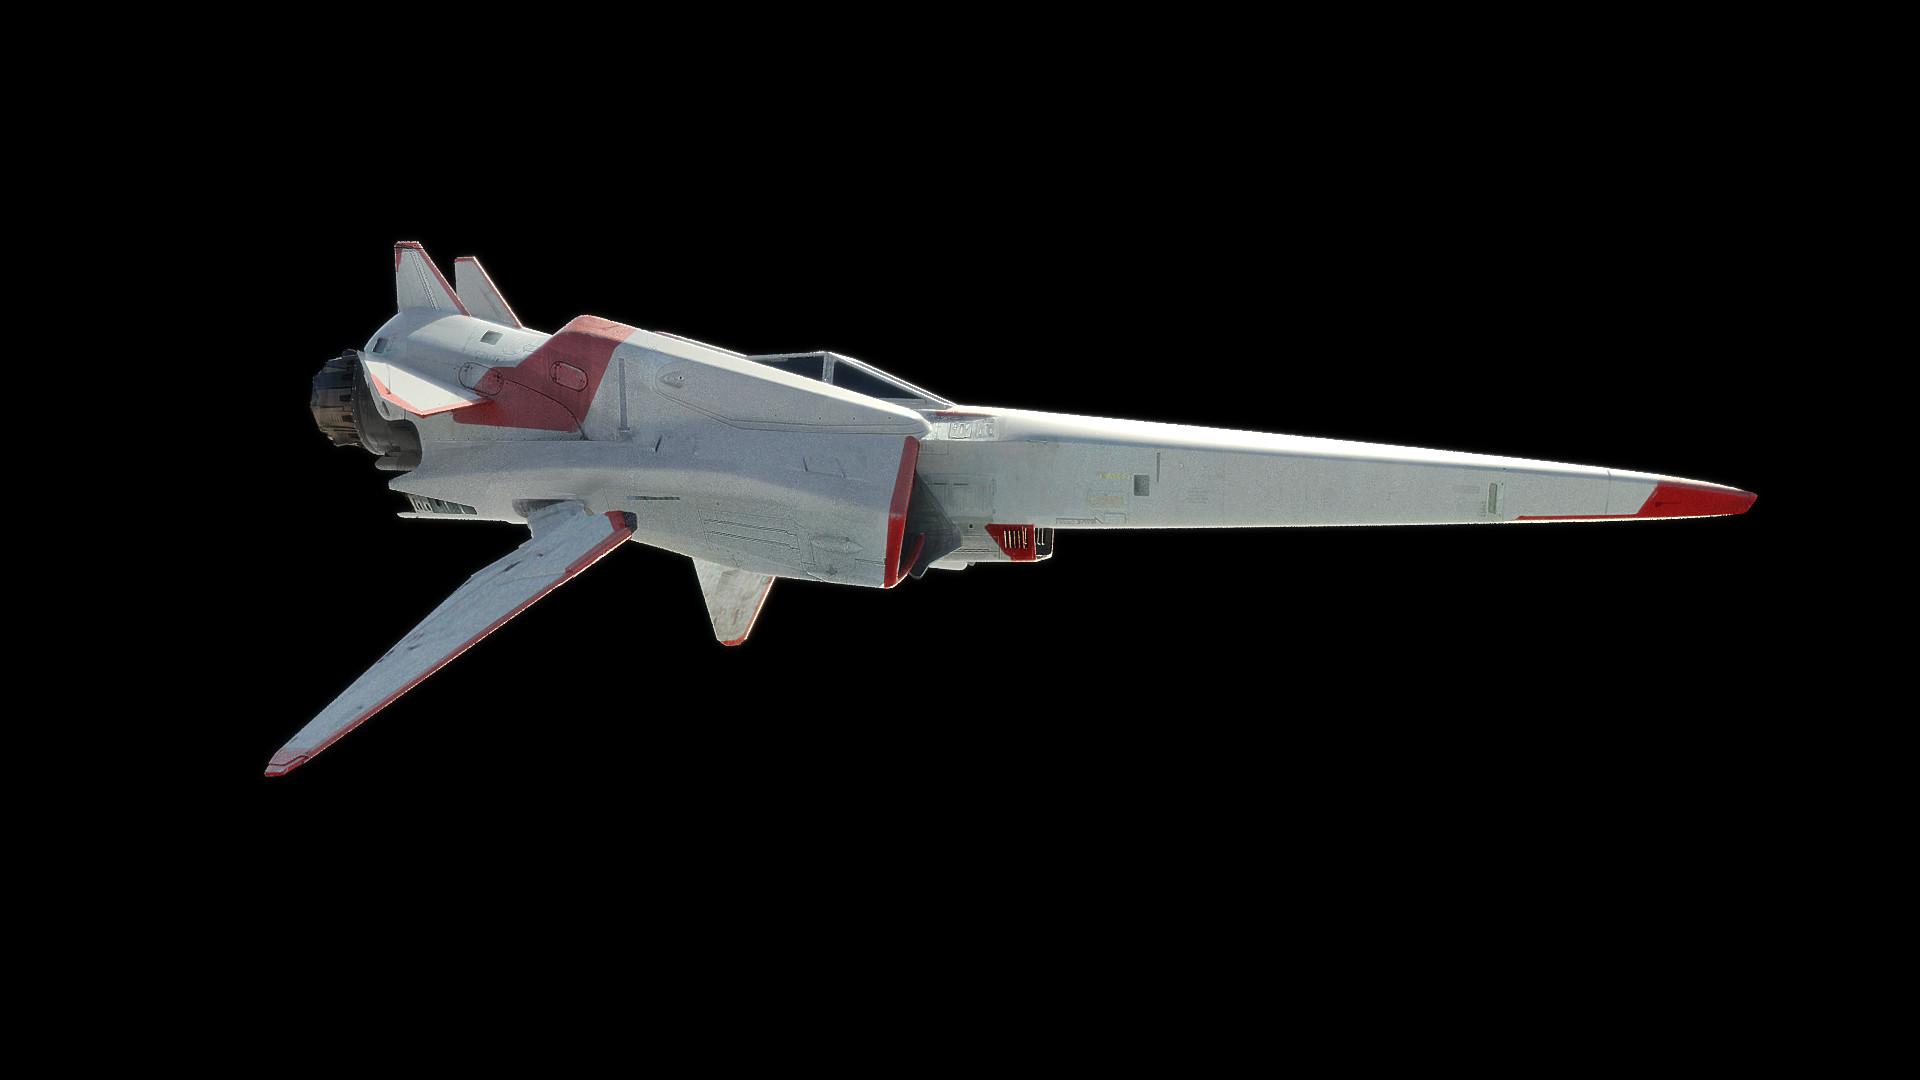 German casado fraga asl spaceship 018 a side overpaint